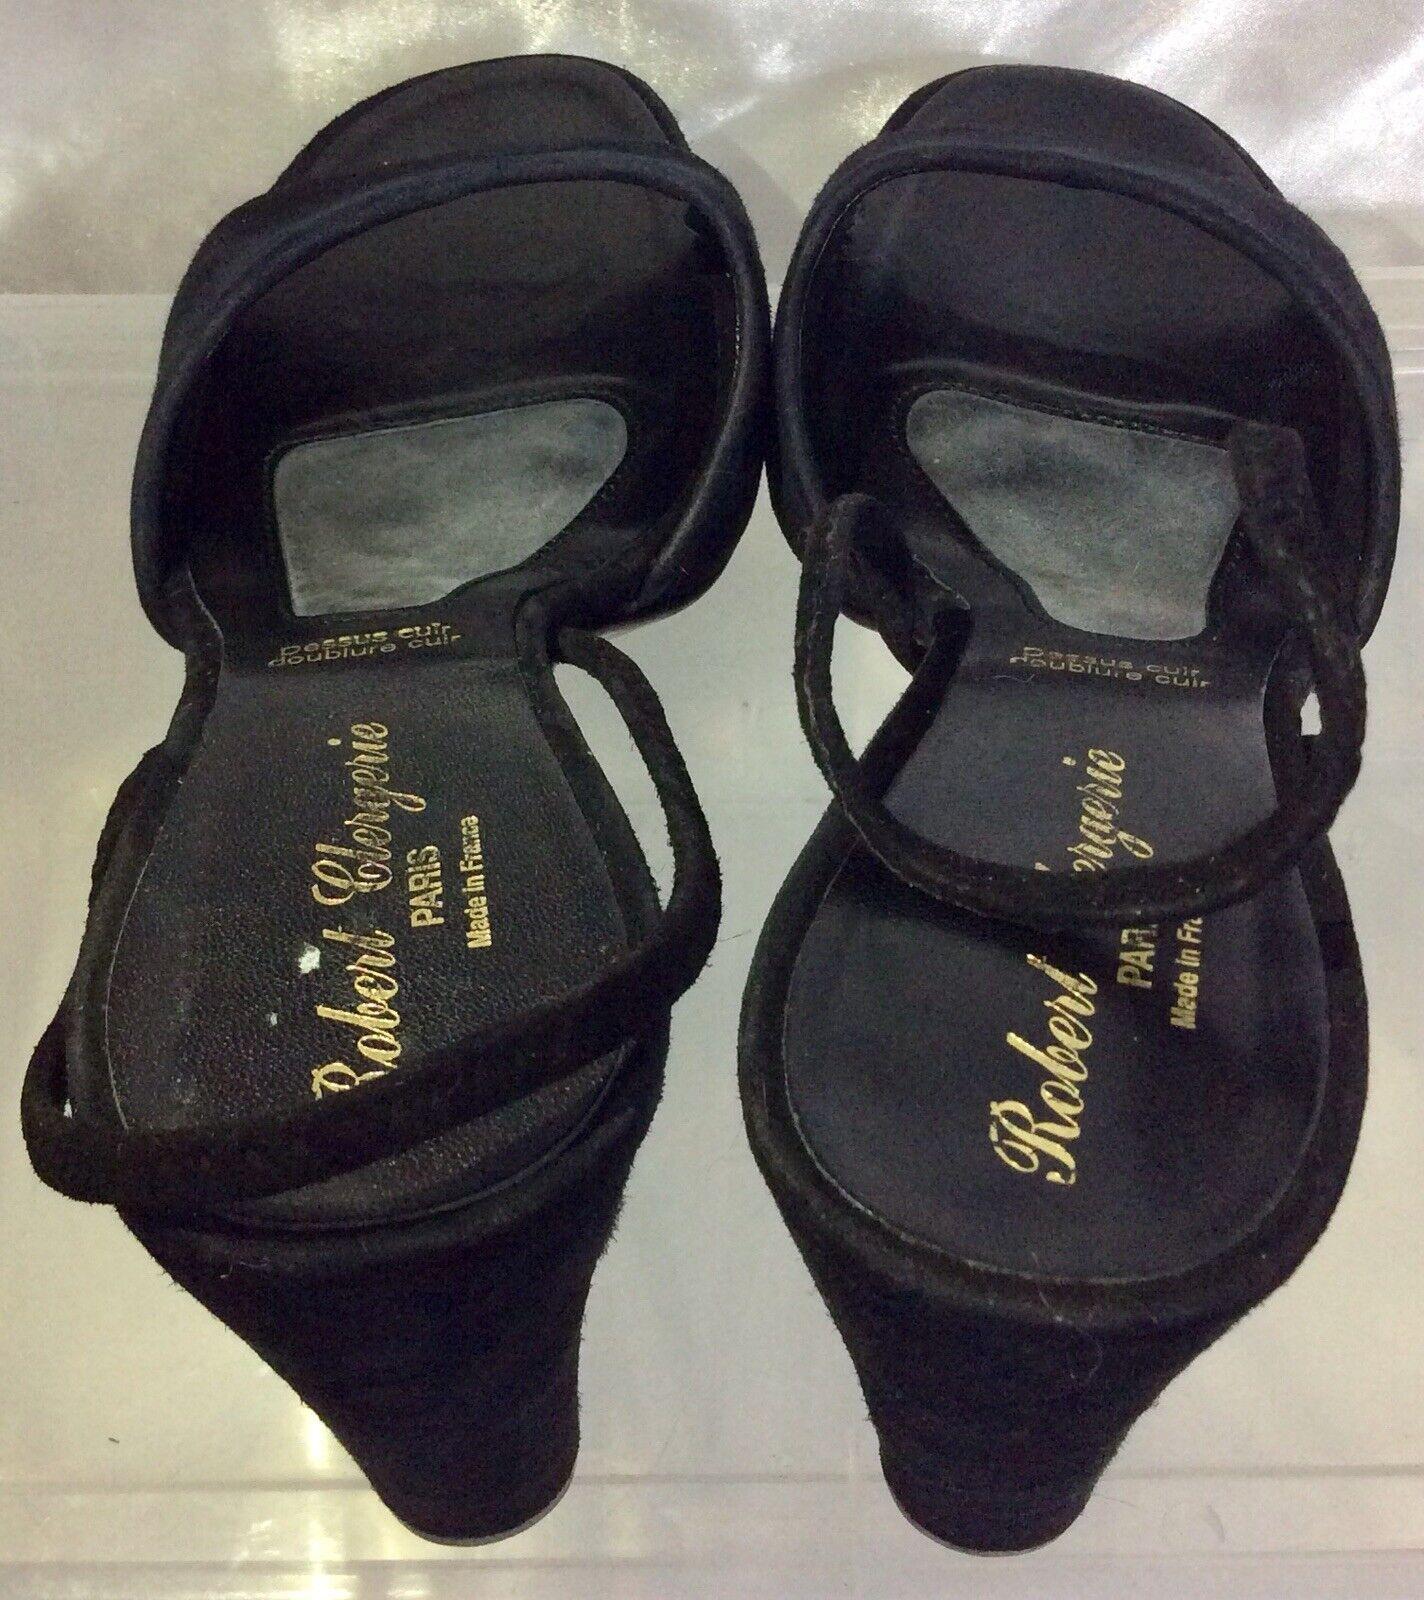 ROBERT CLERGERIE Black Nubuck Nubuck Nubuck Leather Slingback Heels Sandals Women's sz 8.5AA afb61d